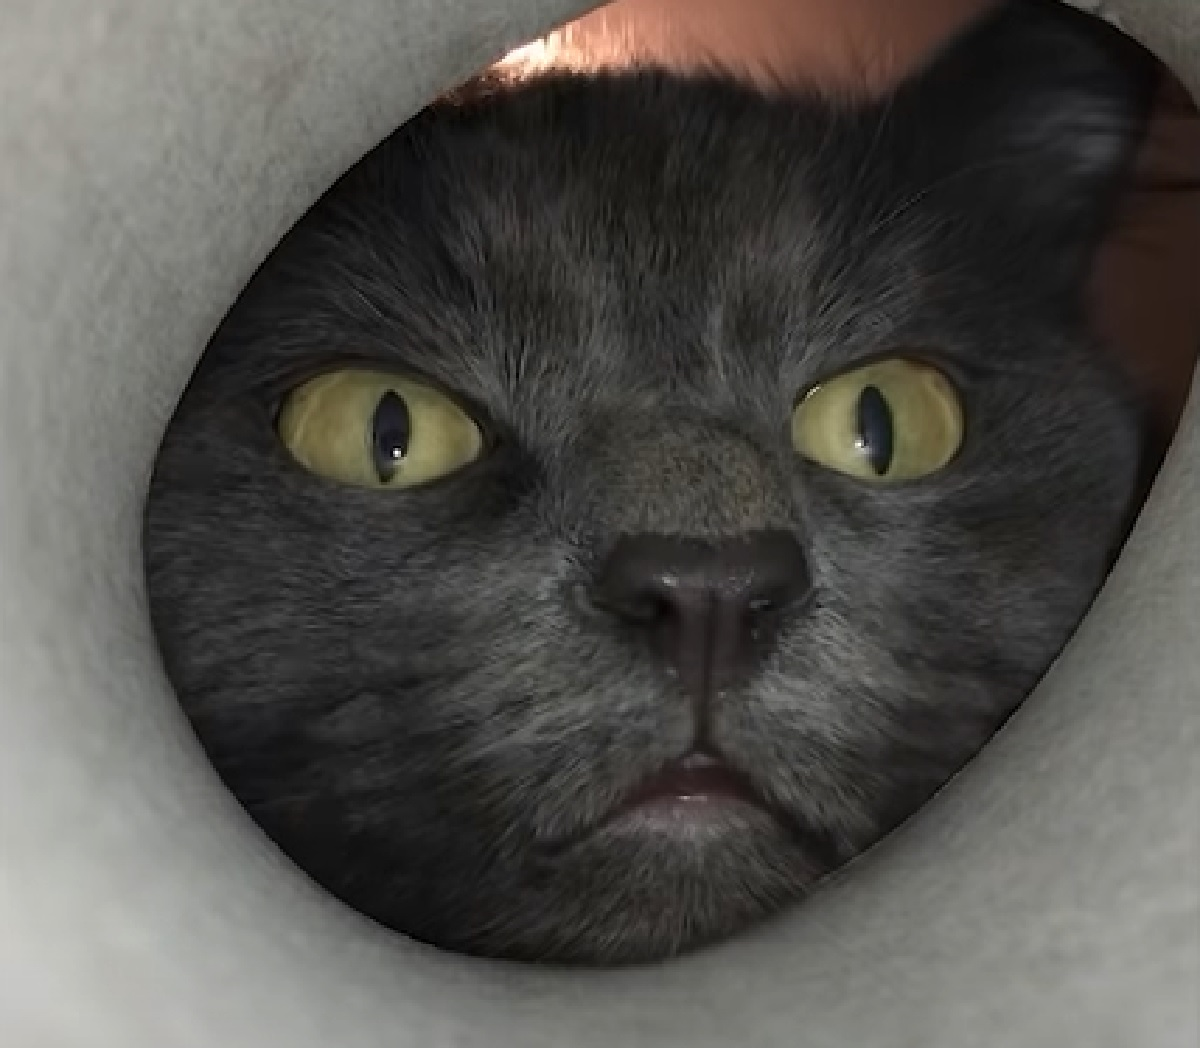 simon gattino fame assurda piena notte